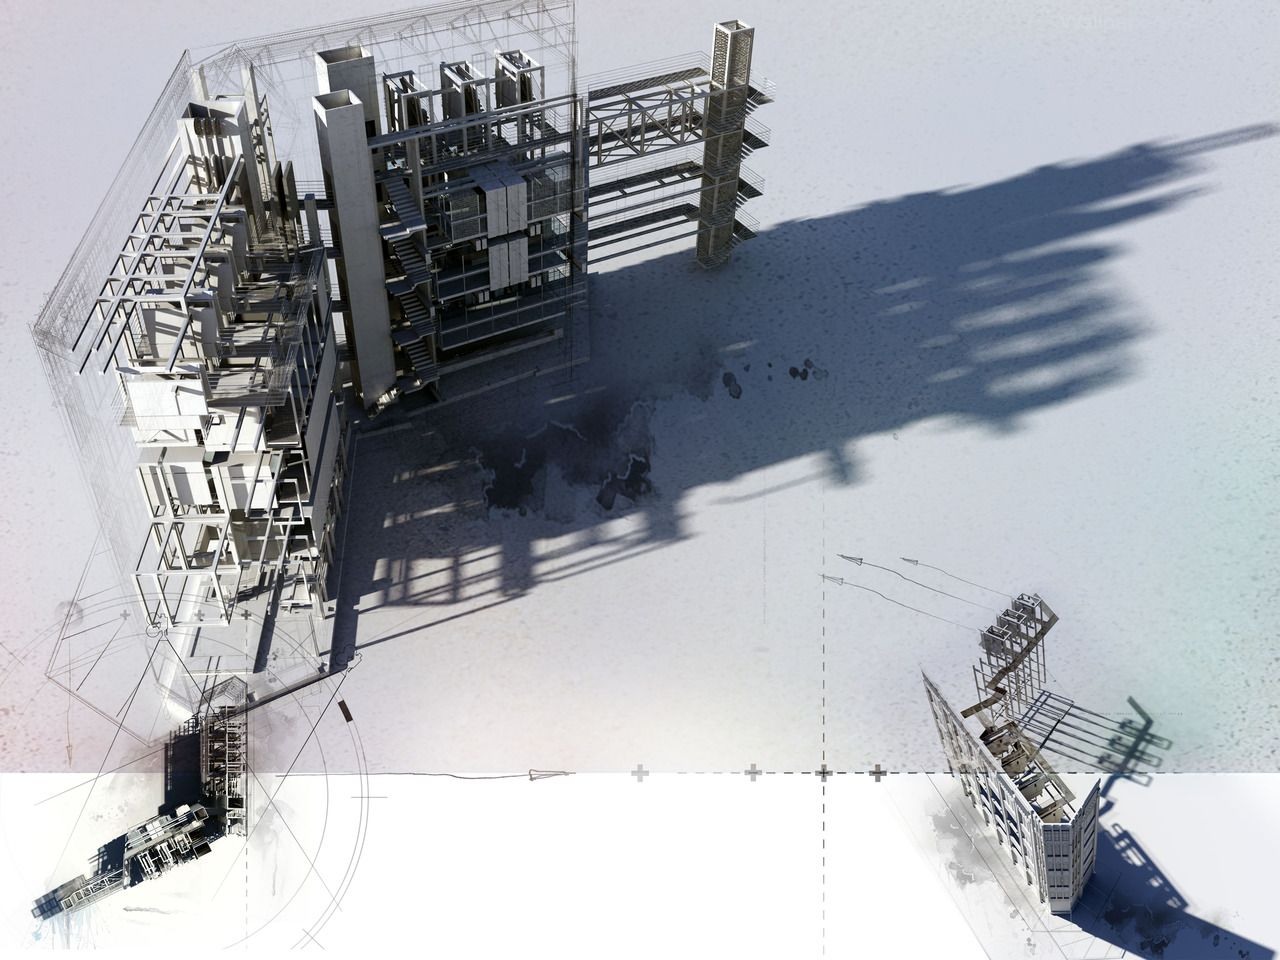 small-medium-large: Tectonic - Overall Intervention Cameron D Price Victoria University of Wellington, NZ